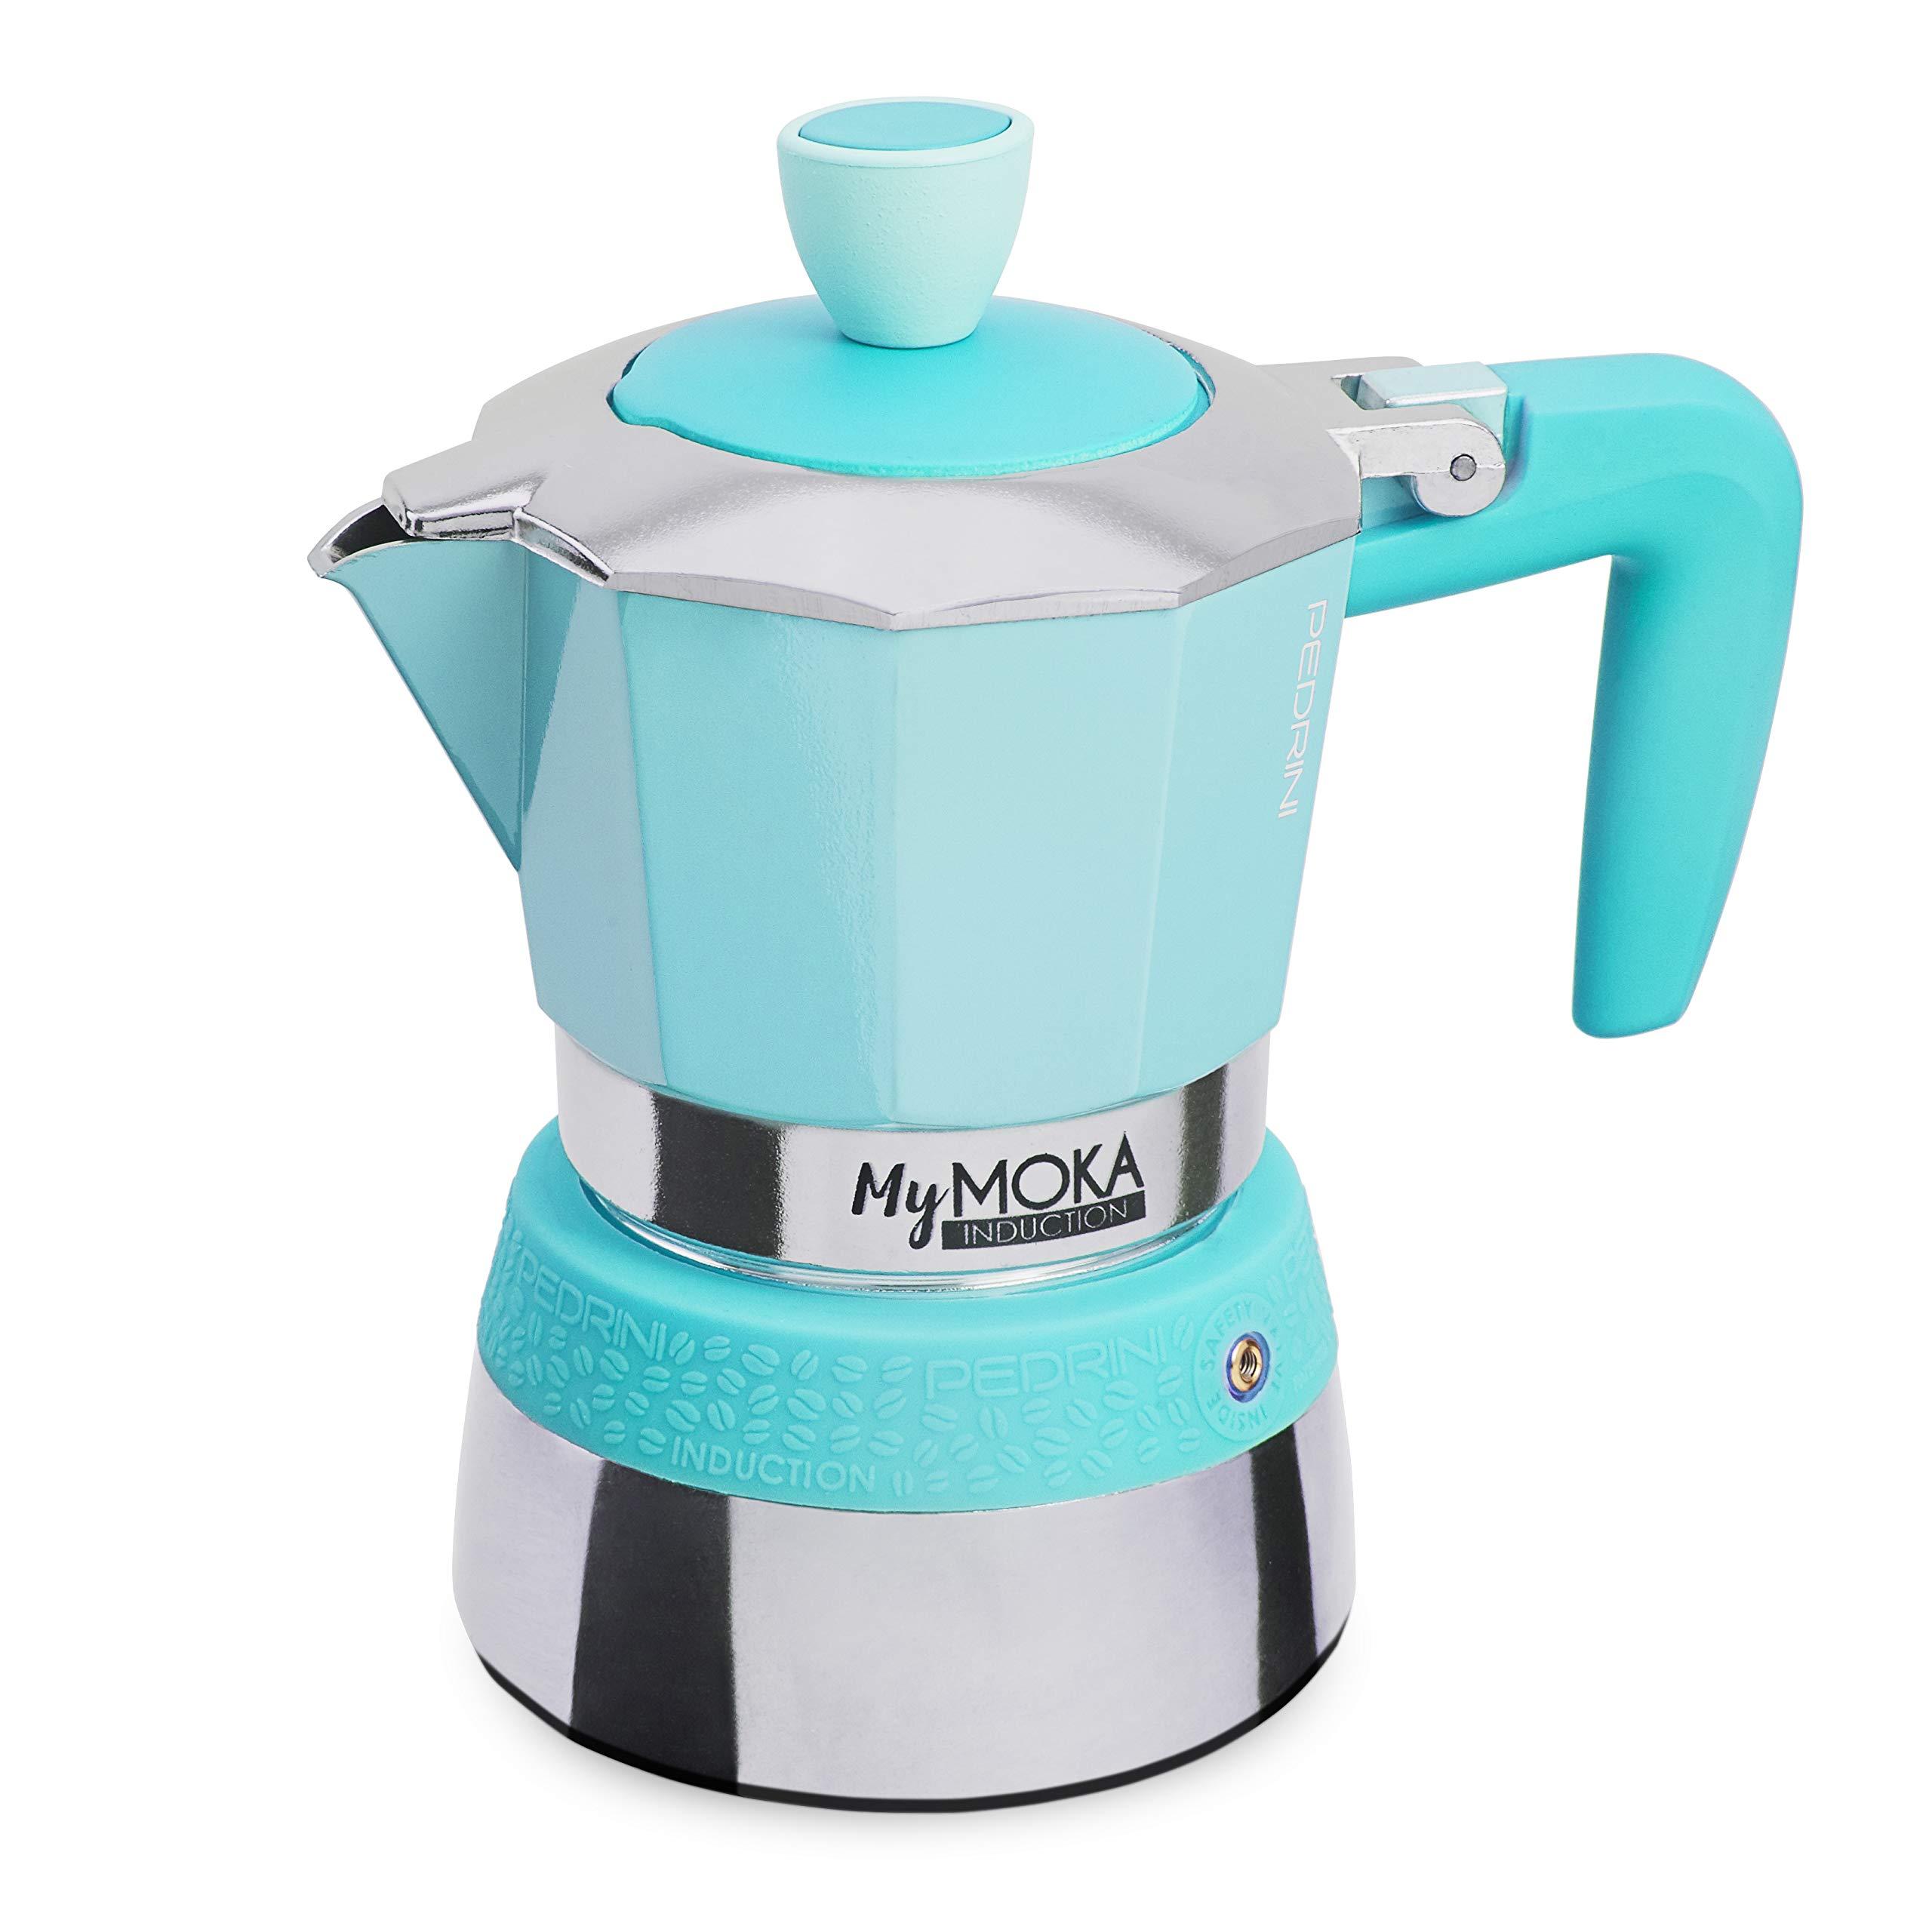 Pedrini Cafetera mymoka Induction, 3 tazas, beachblue: Amazon.es ...